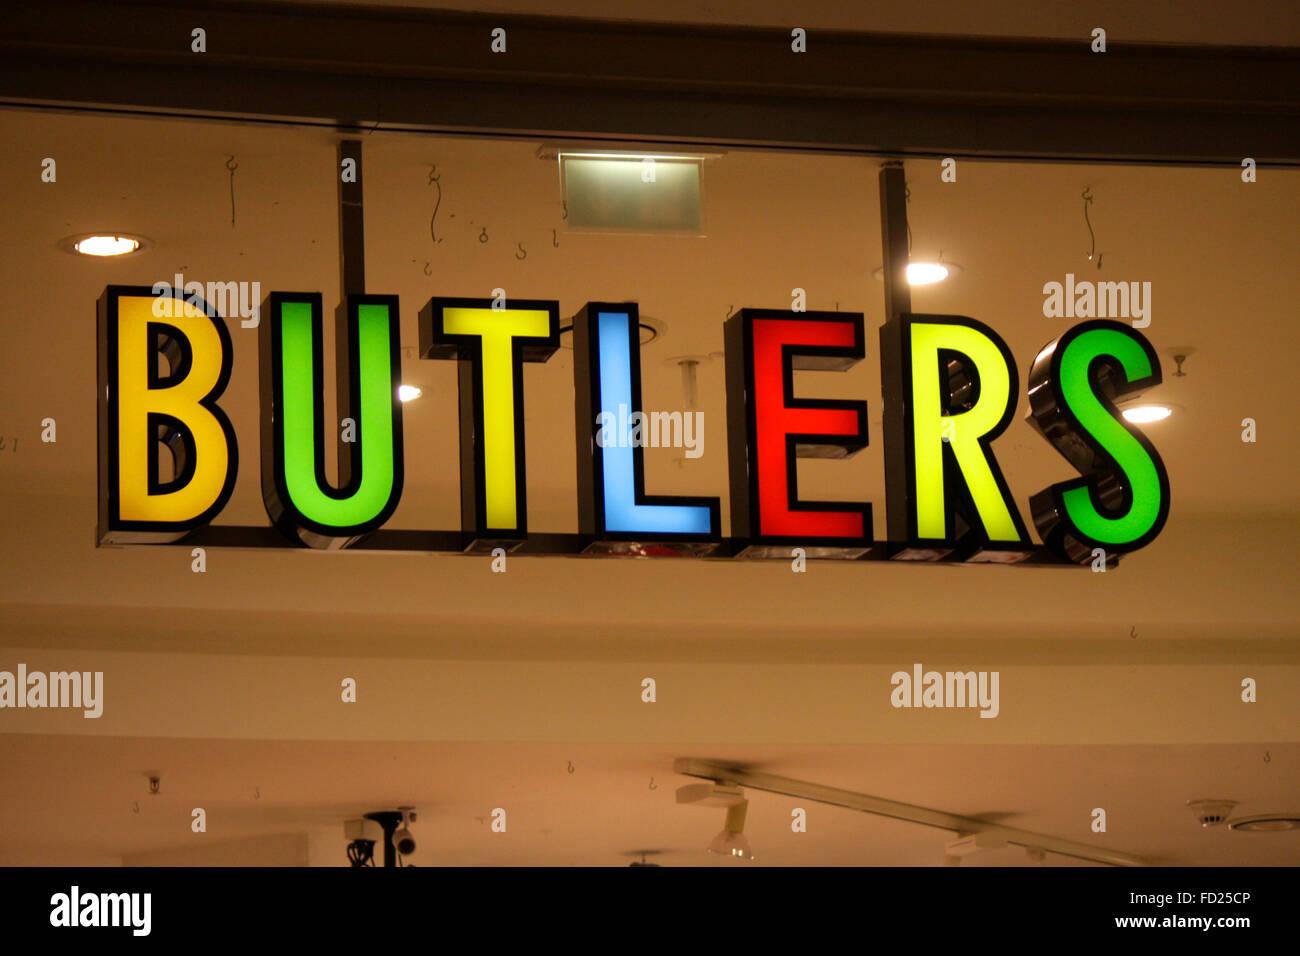 Markenname Butlers Berlin Stock Photo 94090550 Alamy